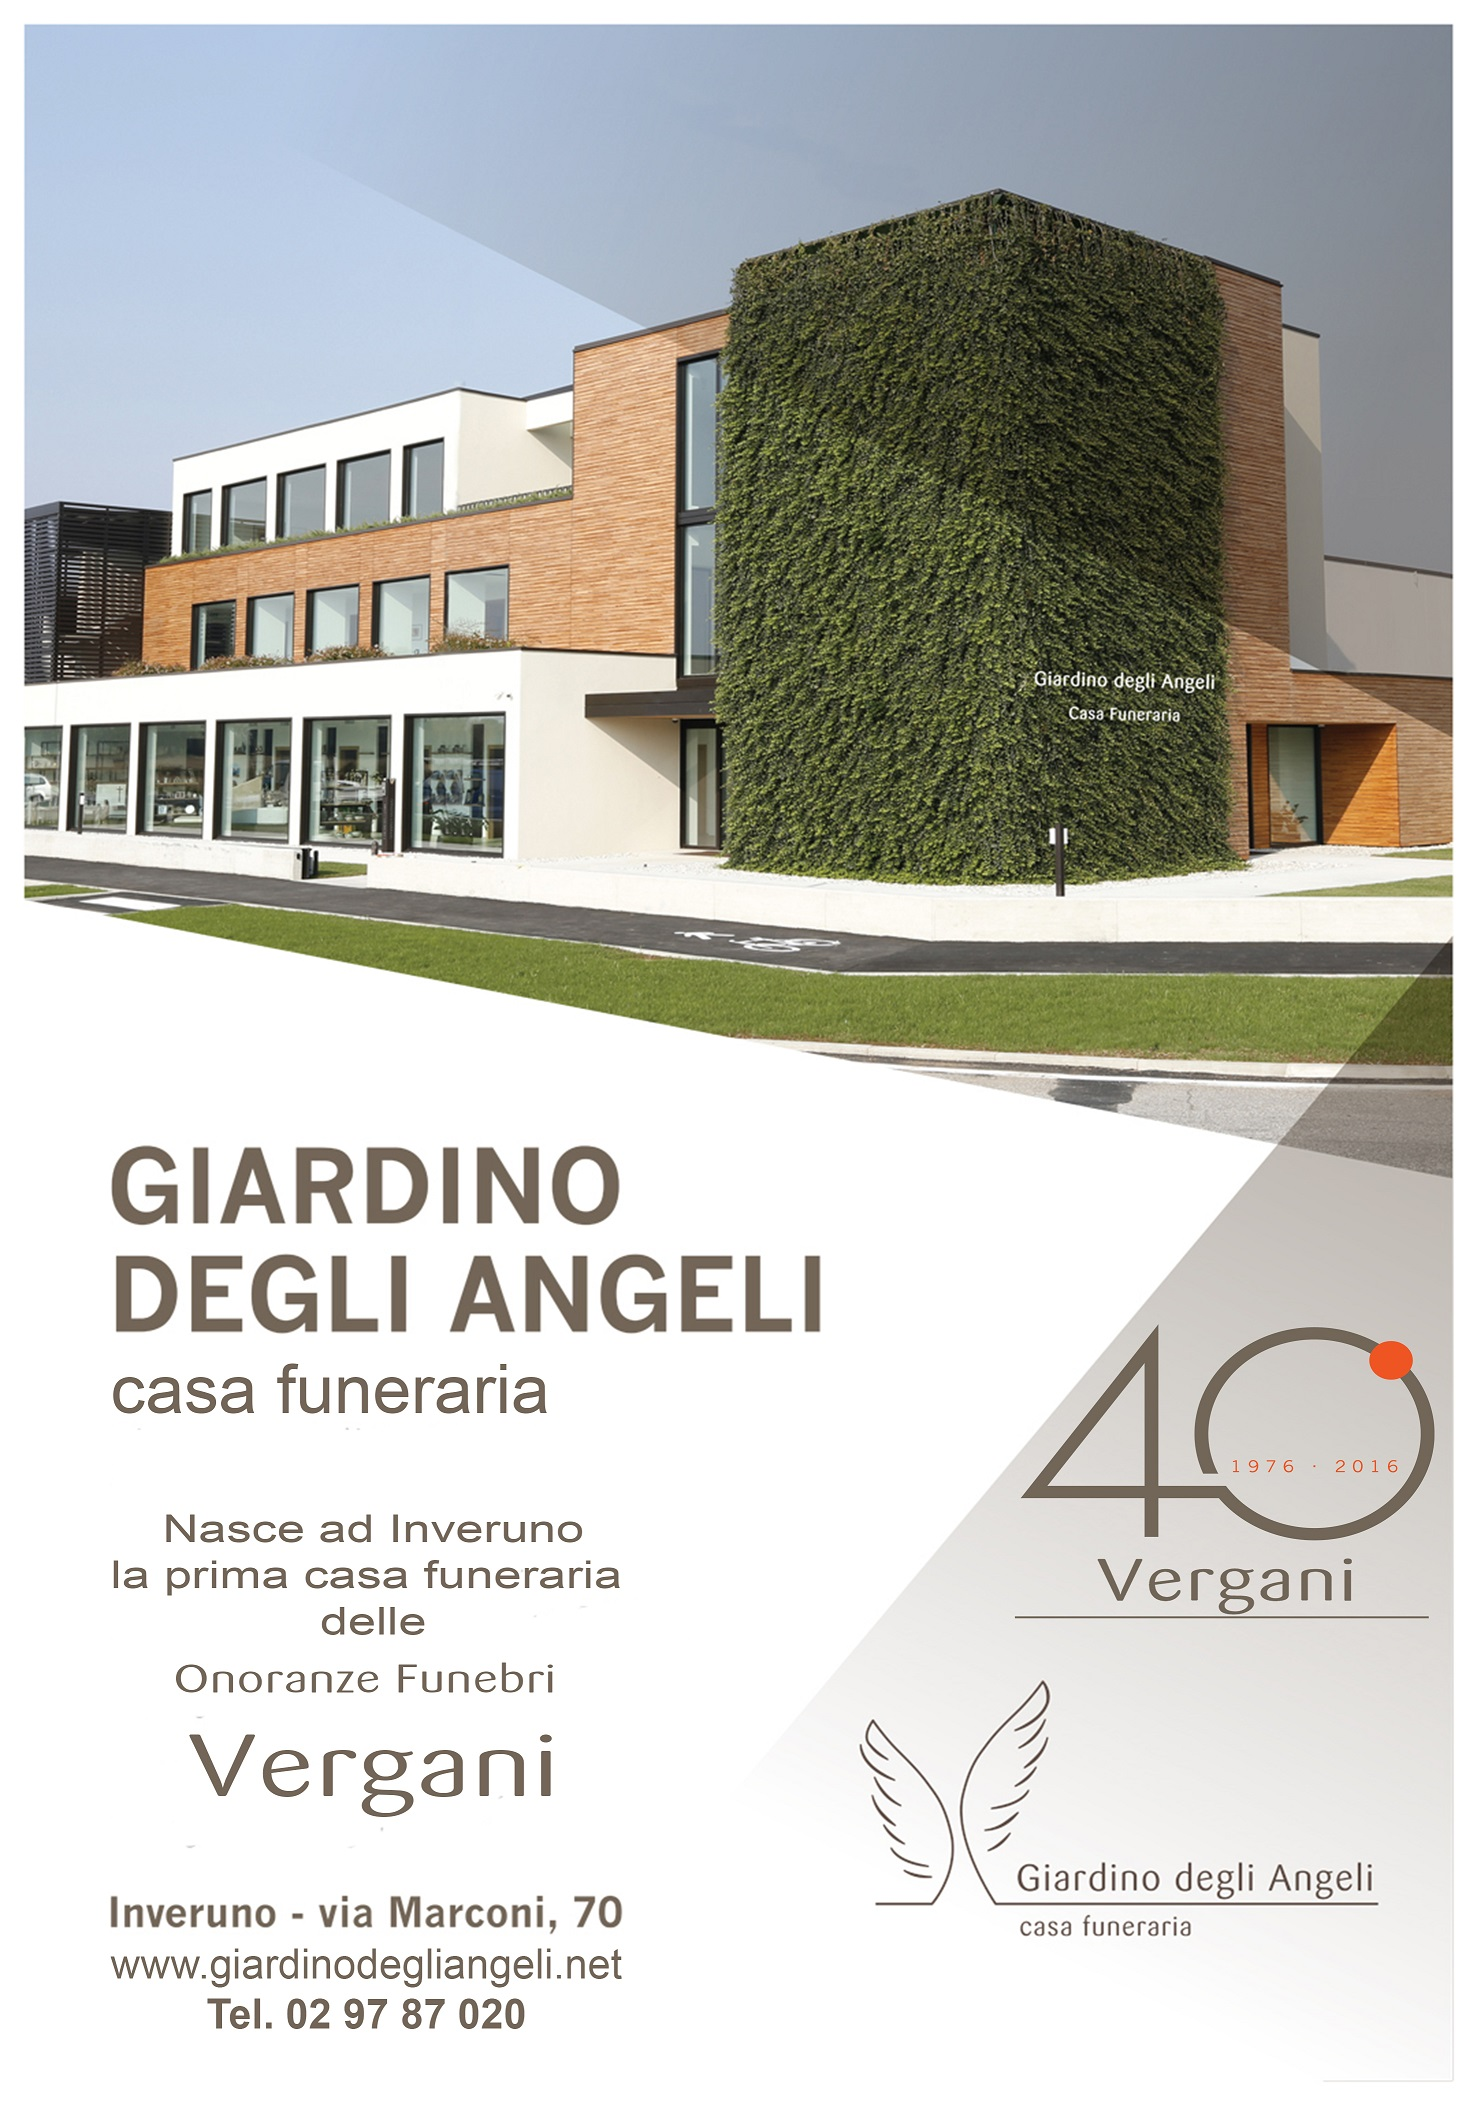 Casa Funeraria 'Giardino degli Angeli'